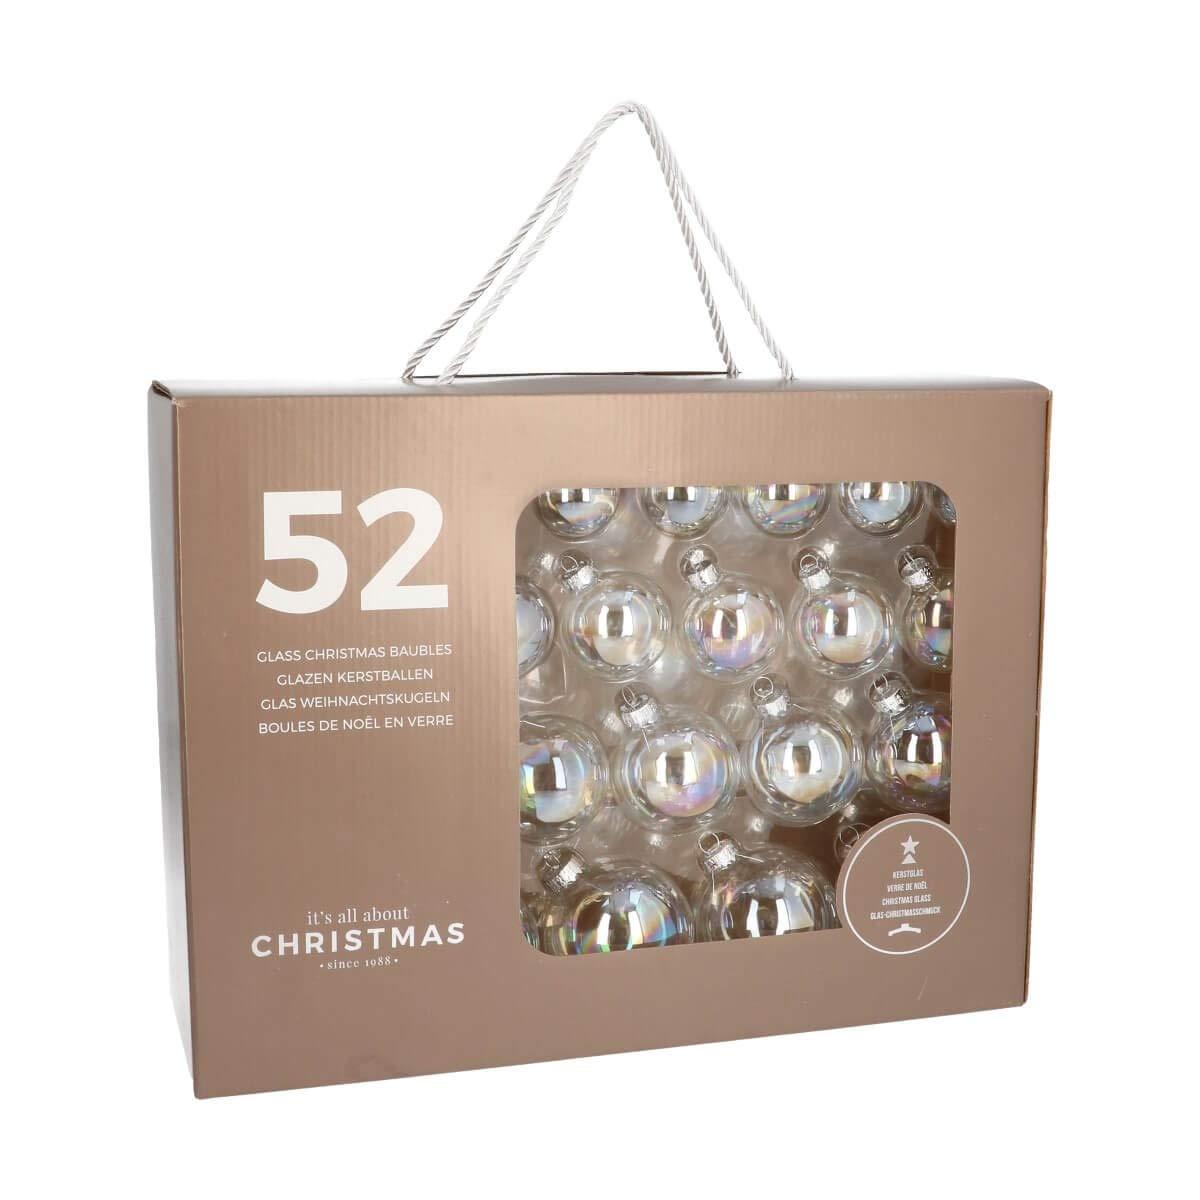 Aufbewahrungsbox Christbaumkugeln.Its All About Christmas 52 Christbaumkugeln Glas